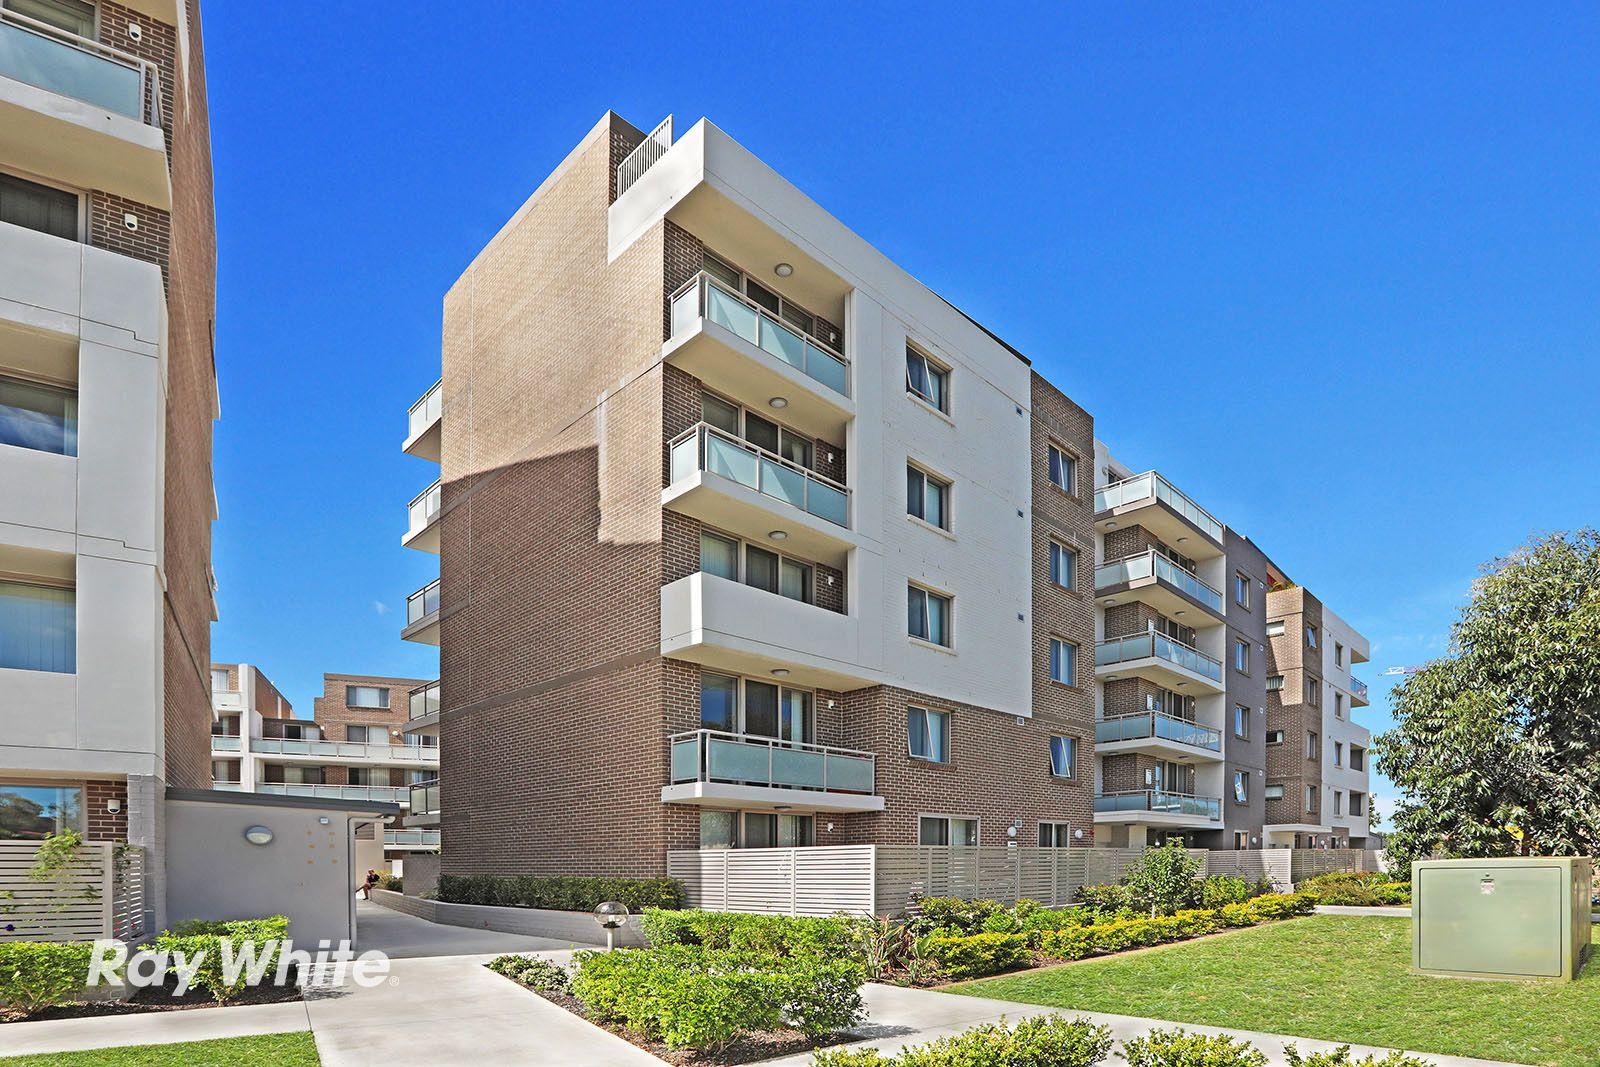 2/13-19 Seven Hills Road, Baulkham Hills NSW 2153, Image 0